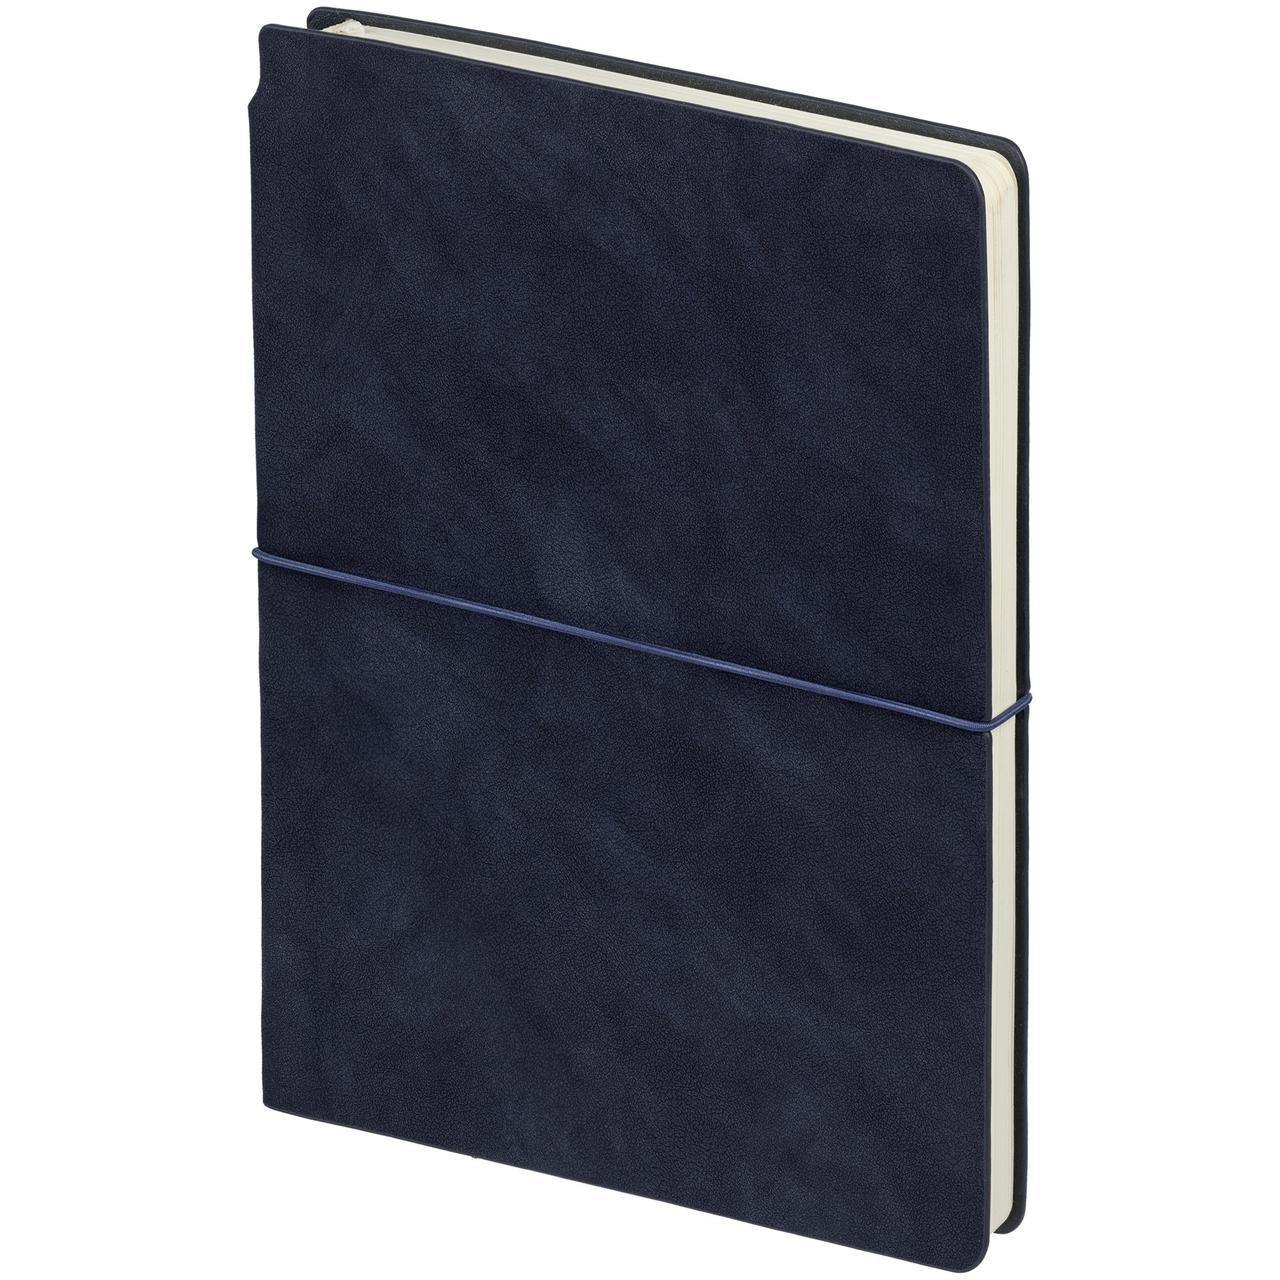 Ежедневник Kuka, недатированный, синий (артикул 17017.40)